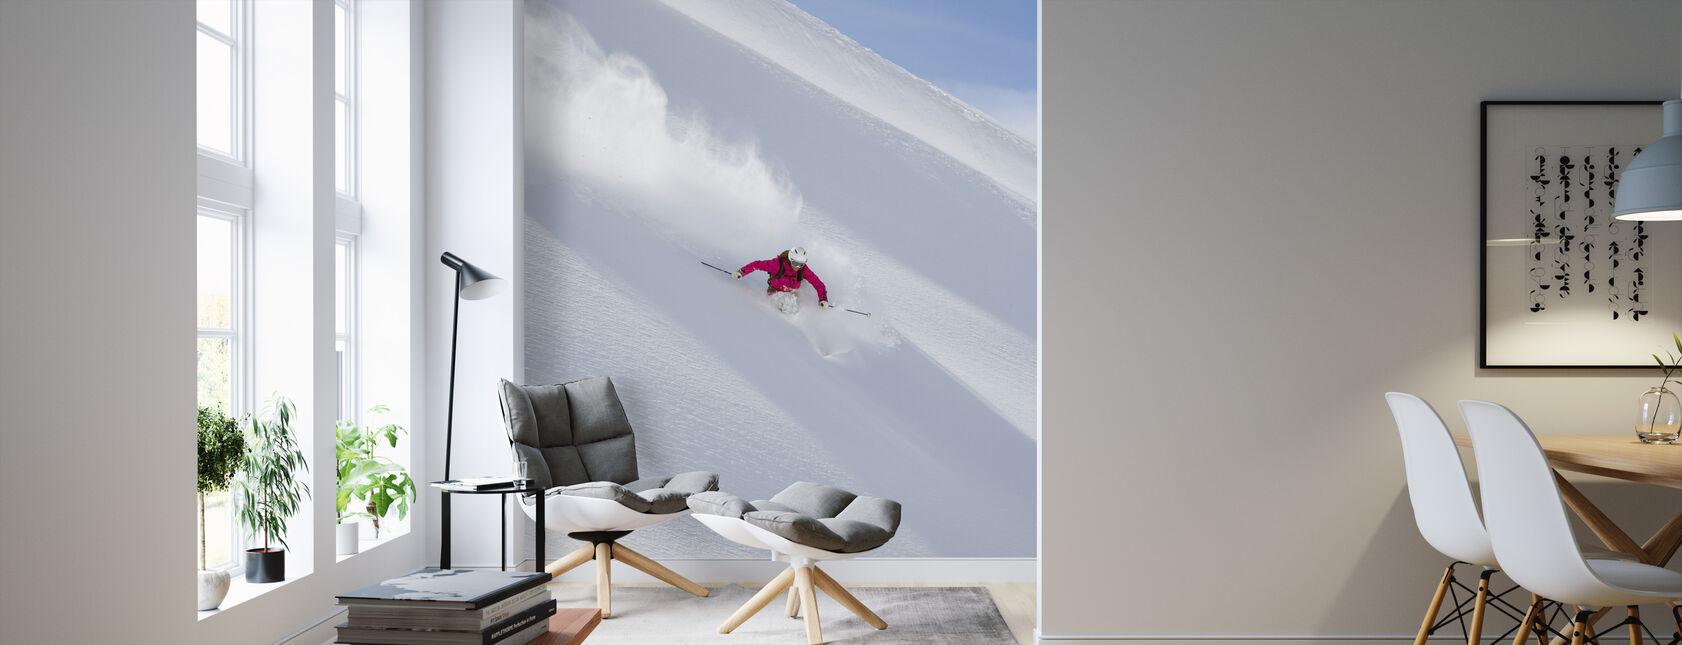 Skiing in Chamonix, France - Wallpaper - Living Room